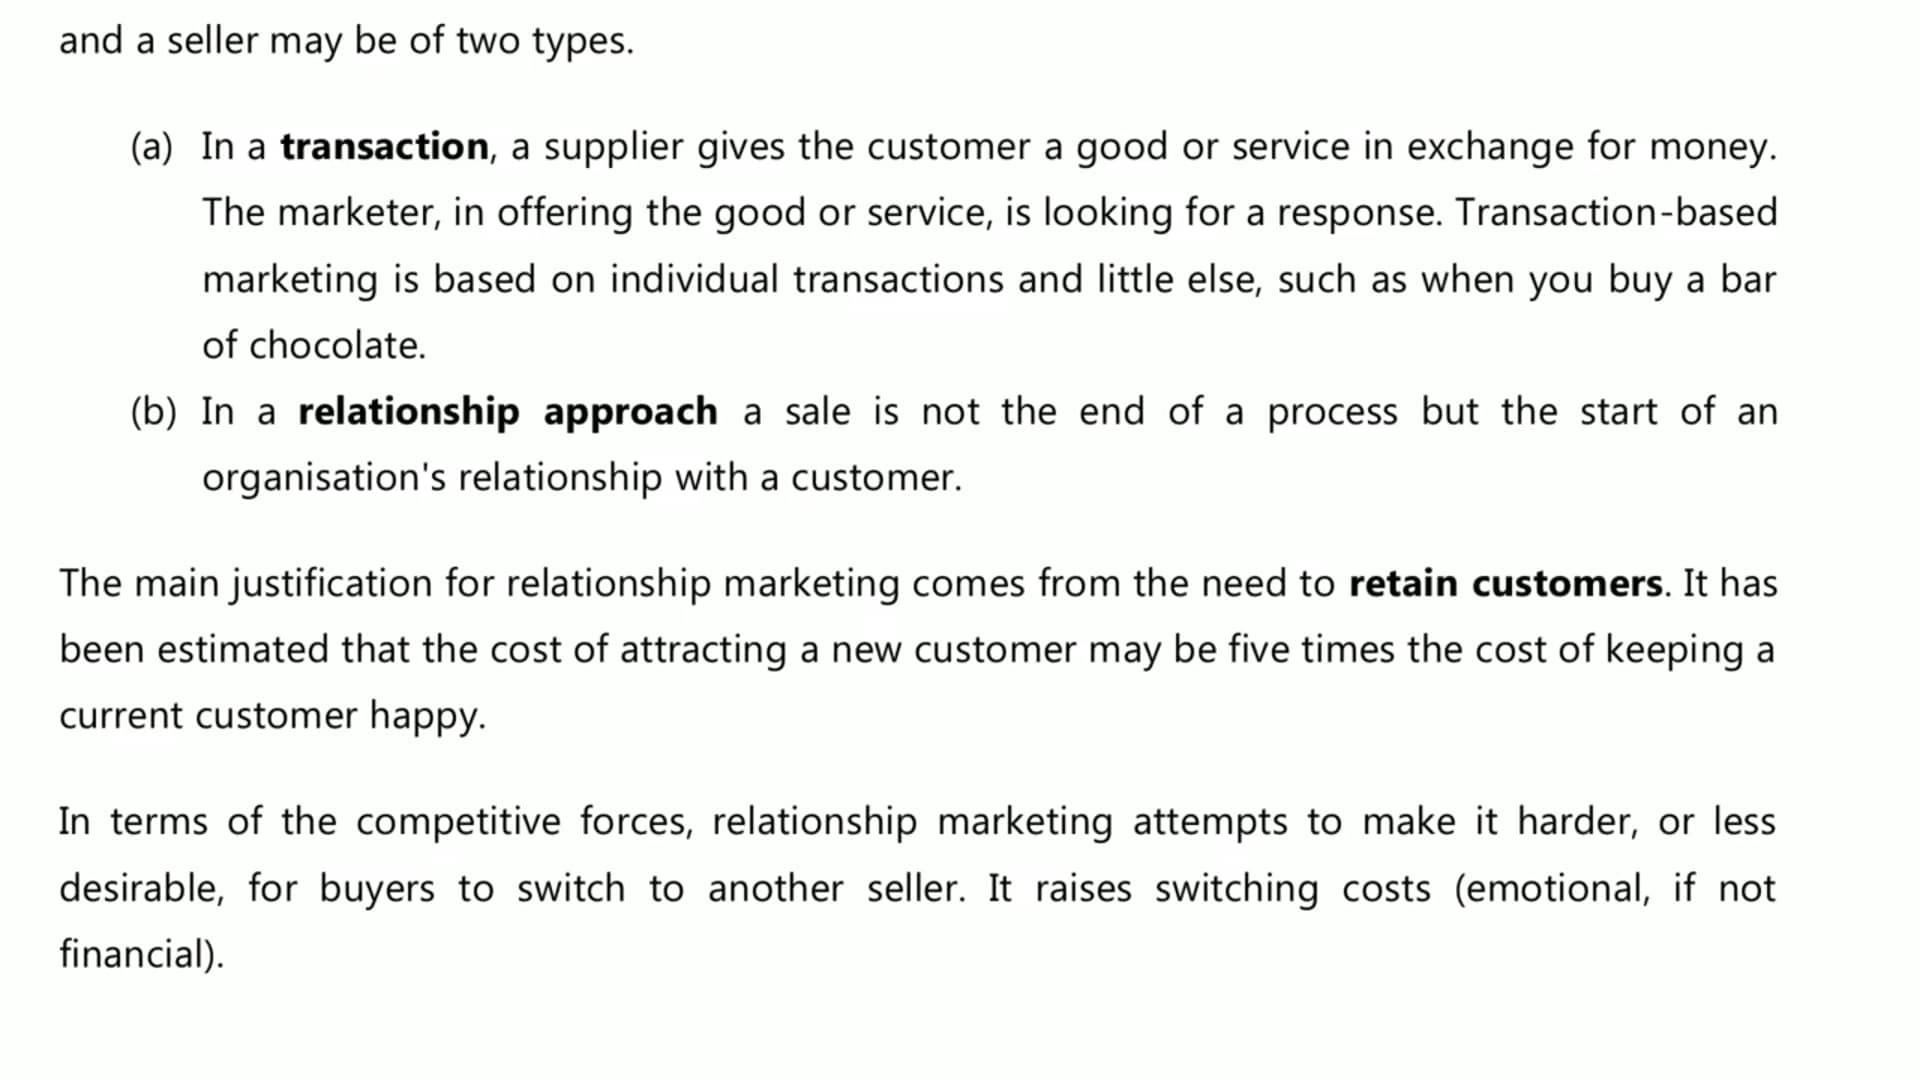 Ch 3 - Relationship Marketing